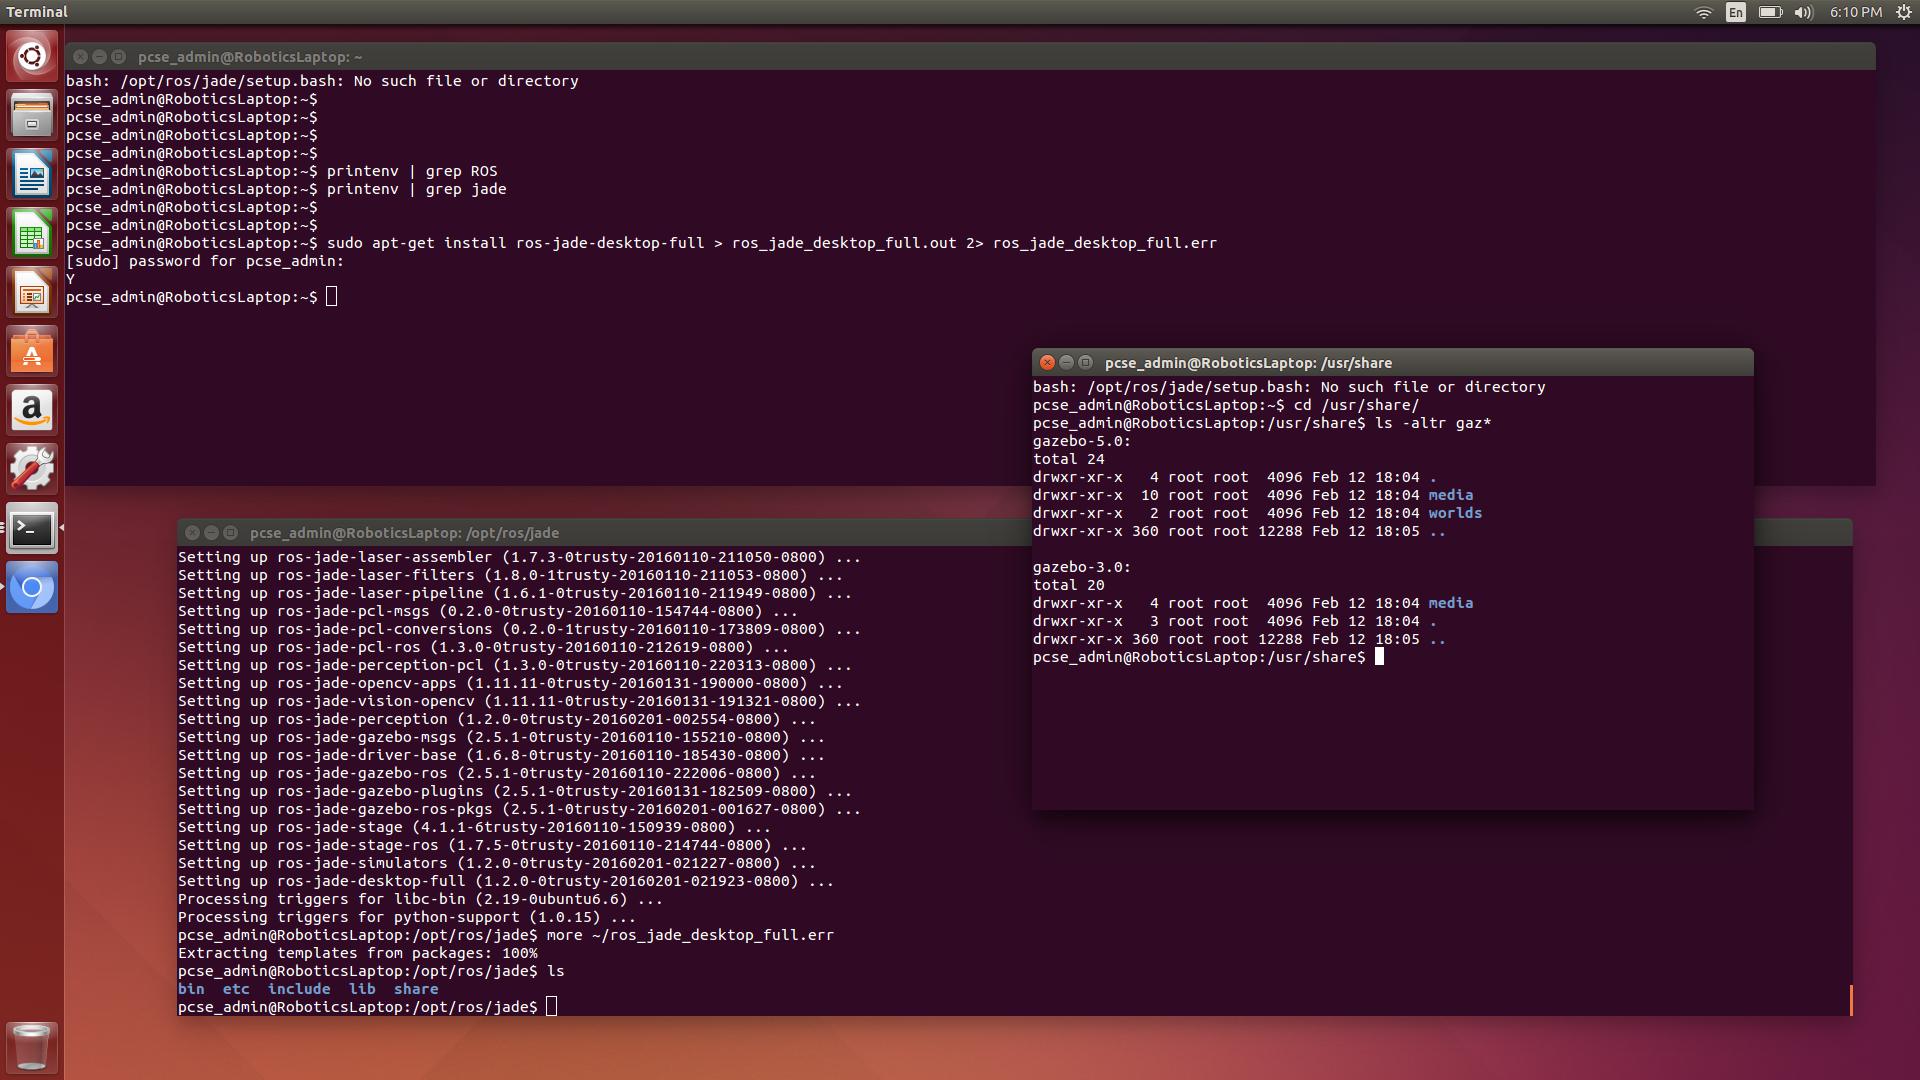 ros-jade-desktop-full not setting up ros or gazebo setup files